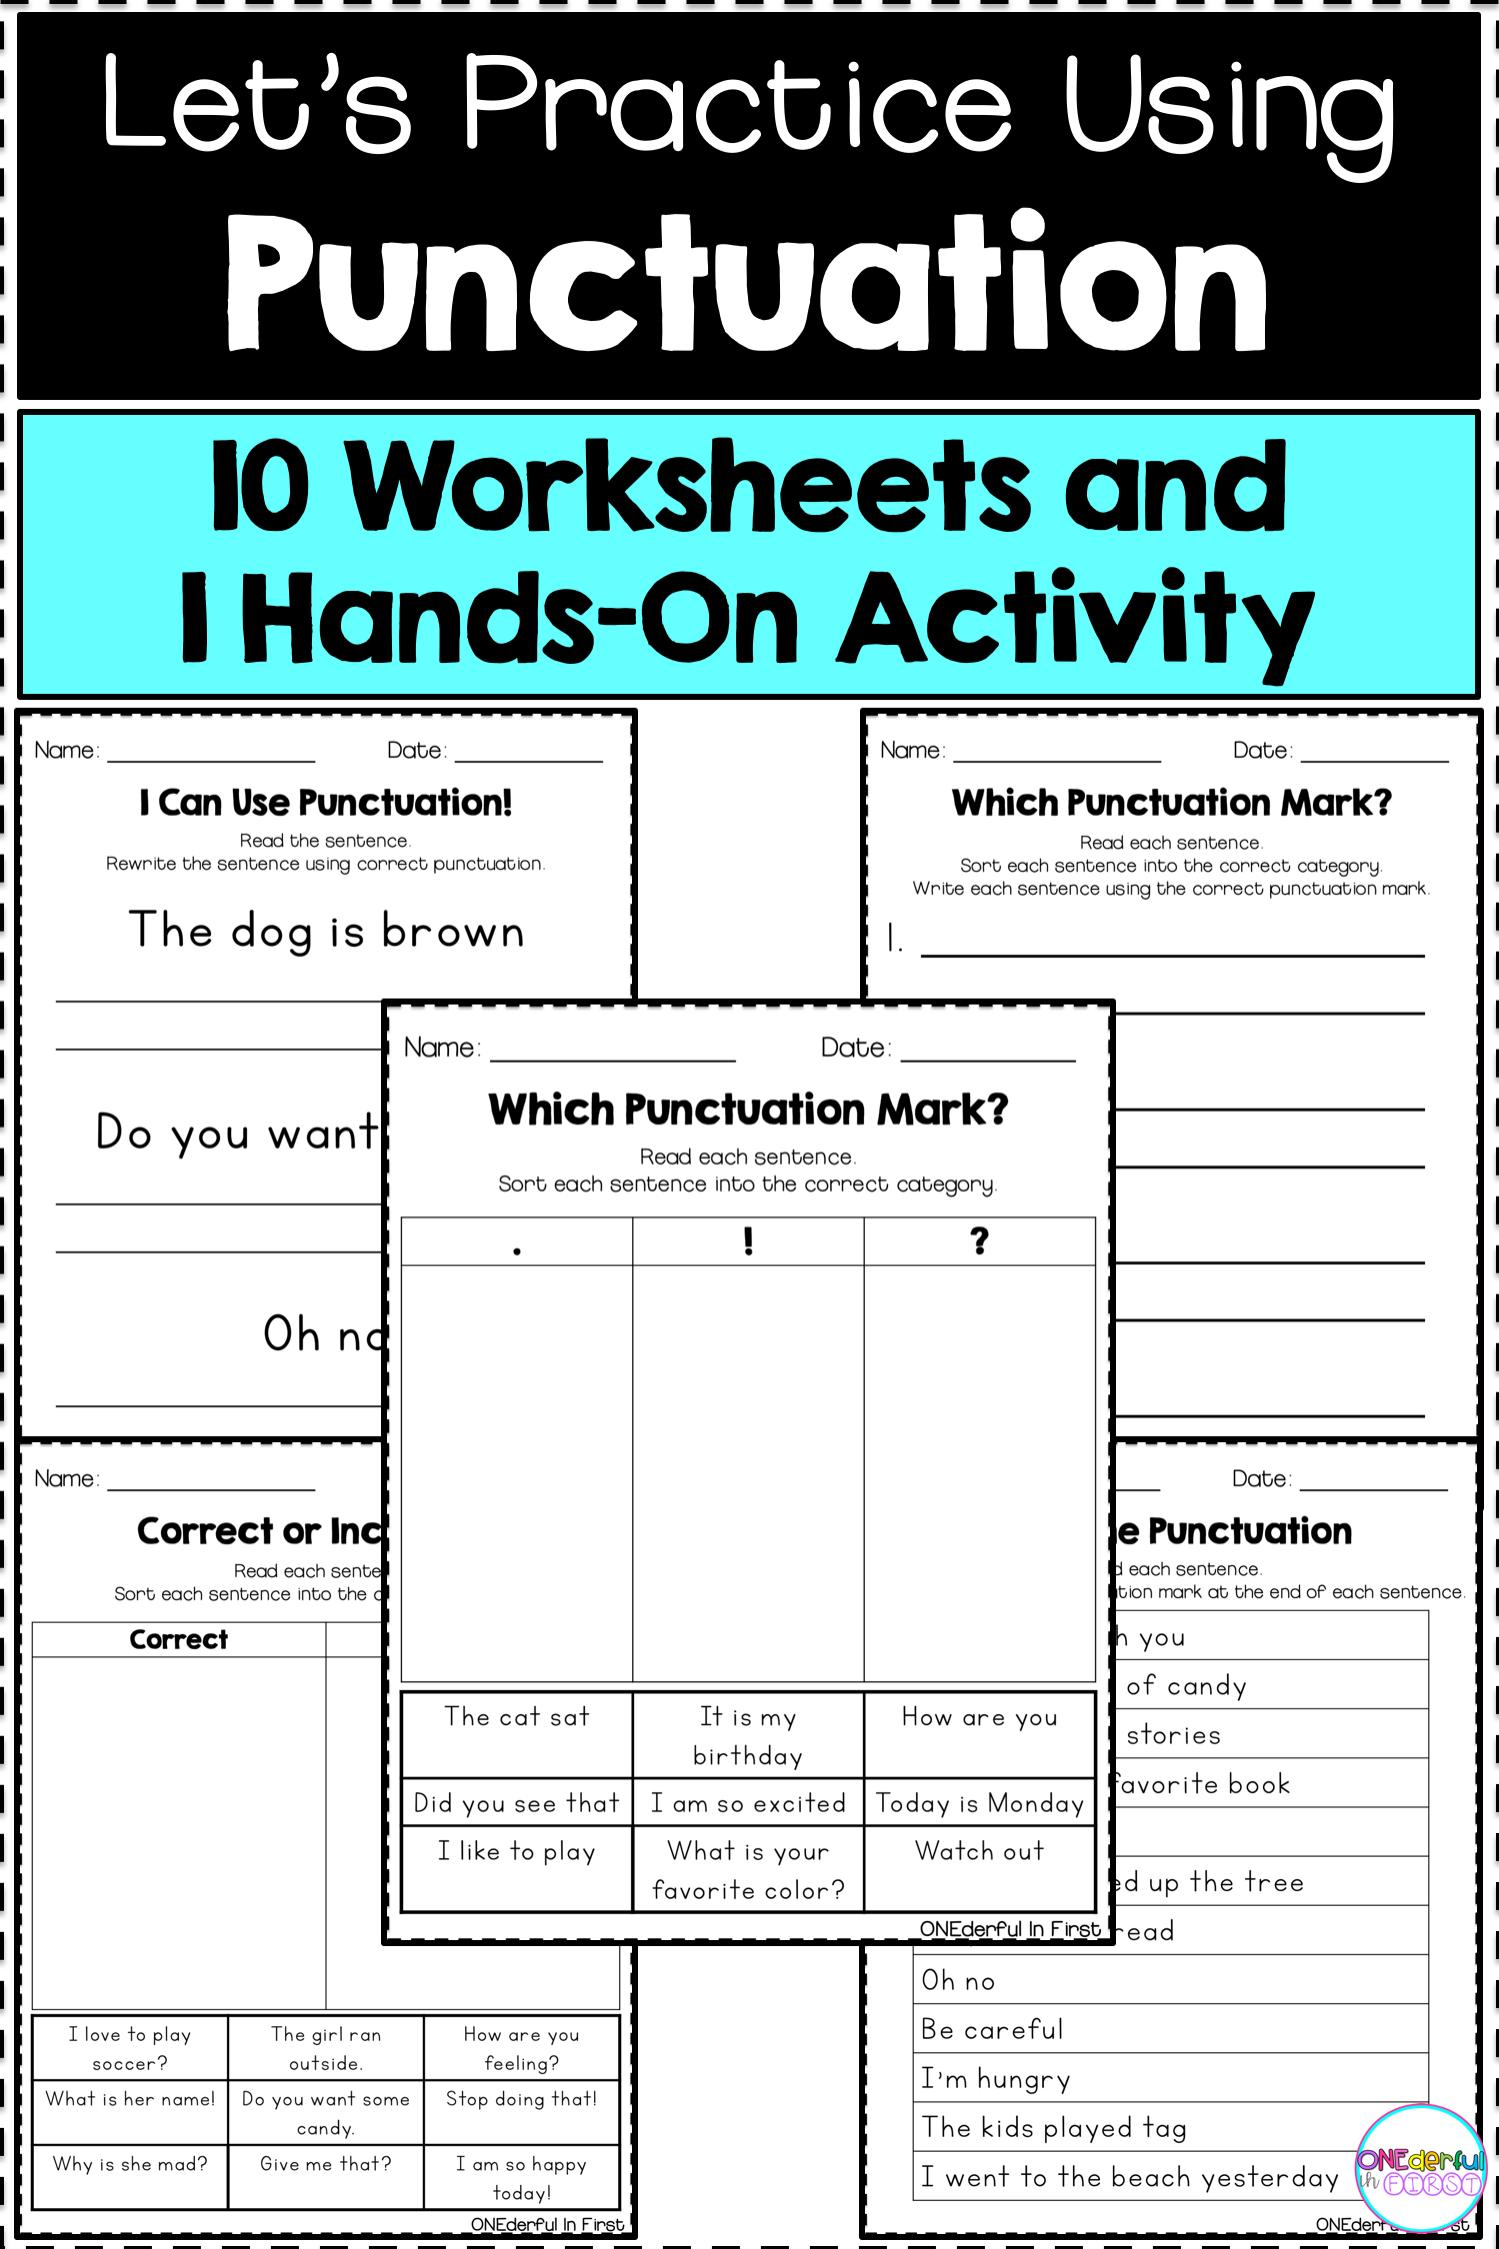 medium resolution of Punctuation - Worksheets and Hands-On Activity   Punctuation worksheets